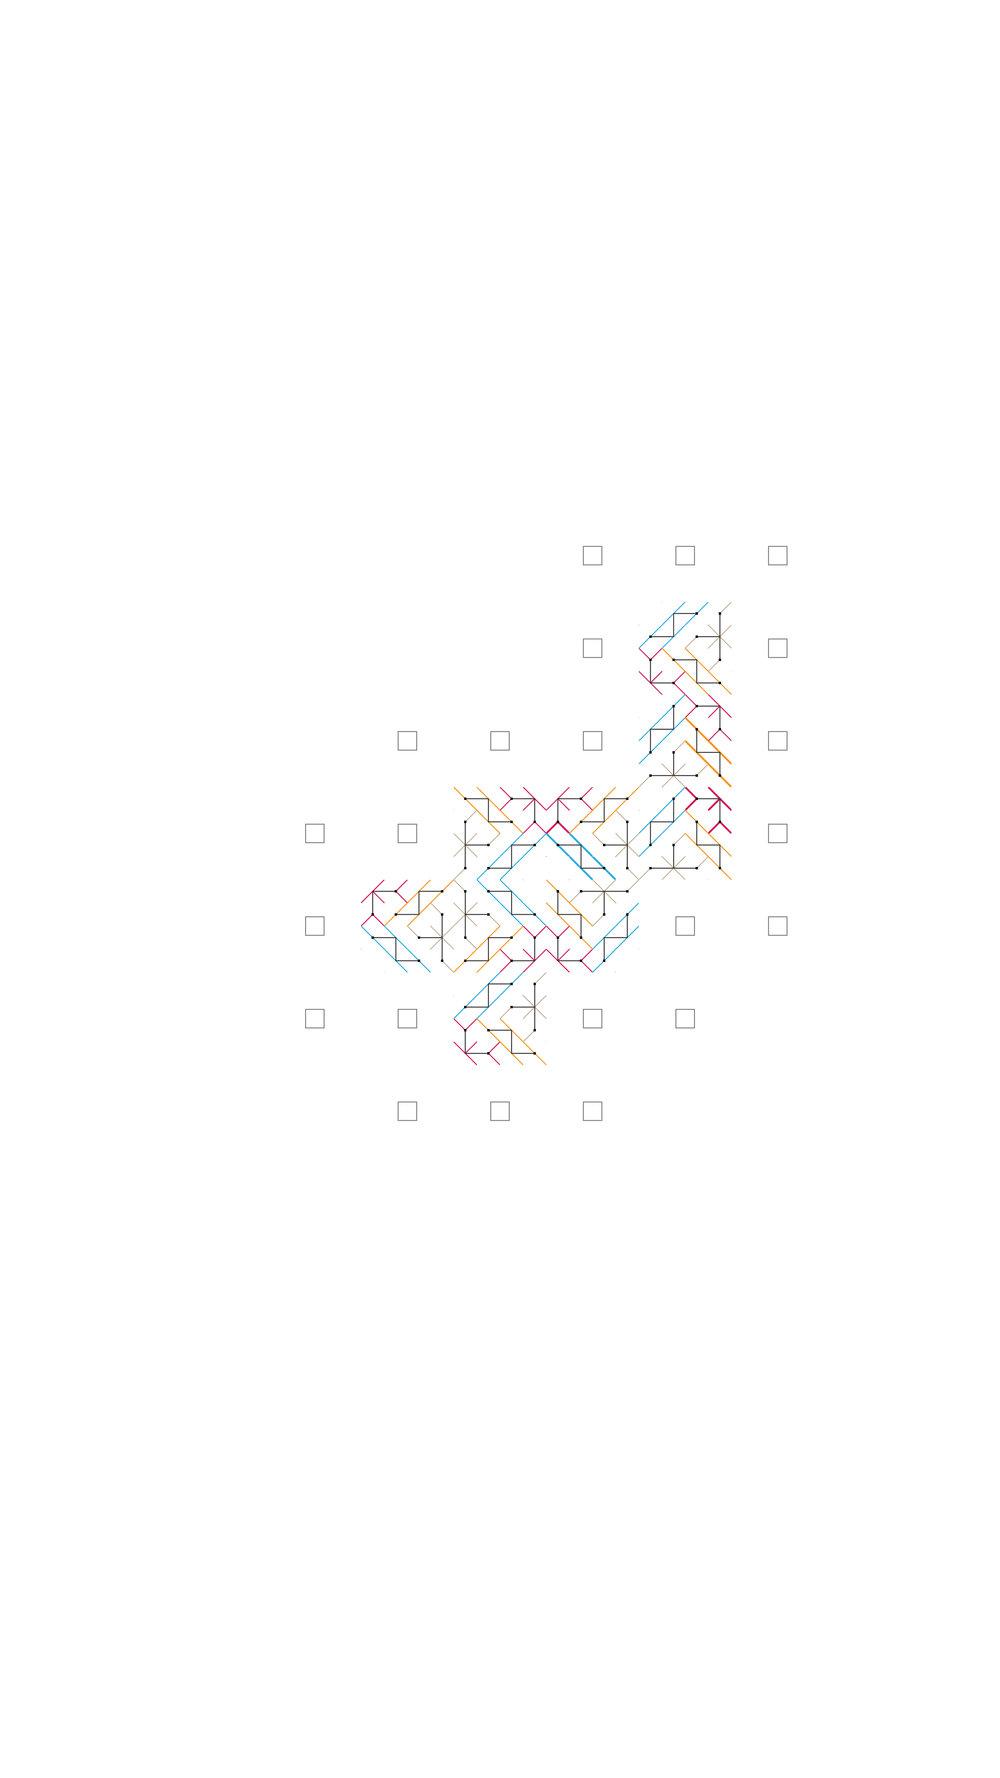 proky experimentation 4-19.jpg